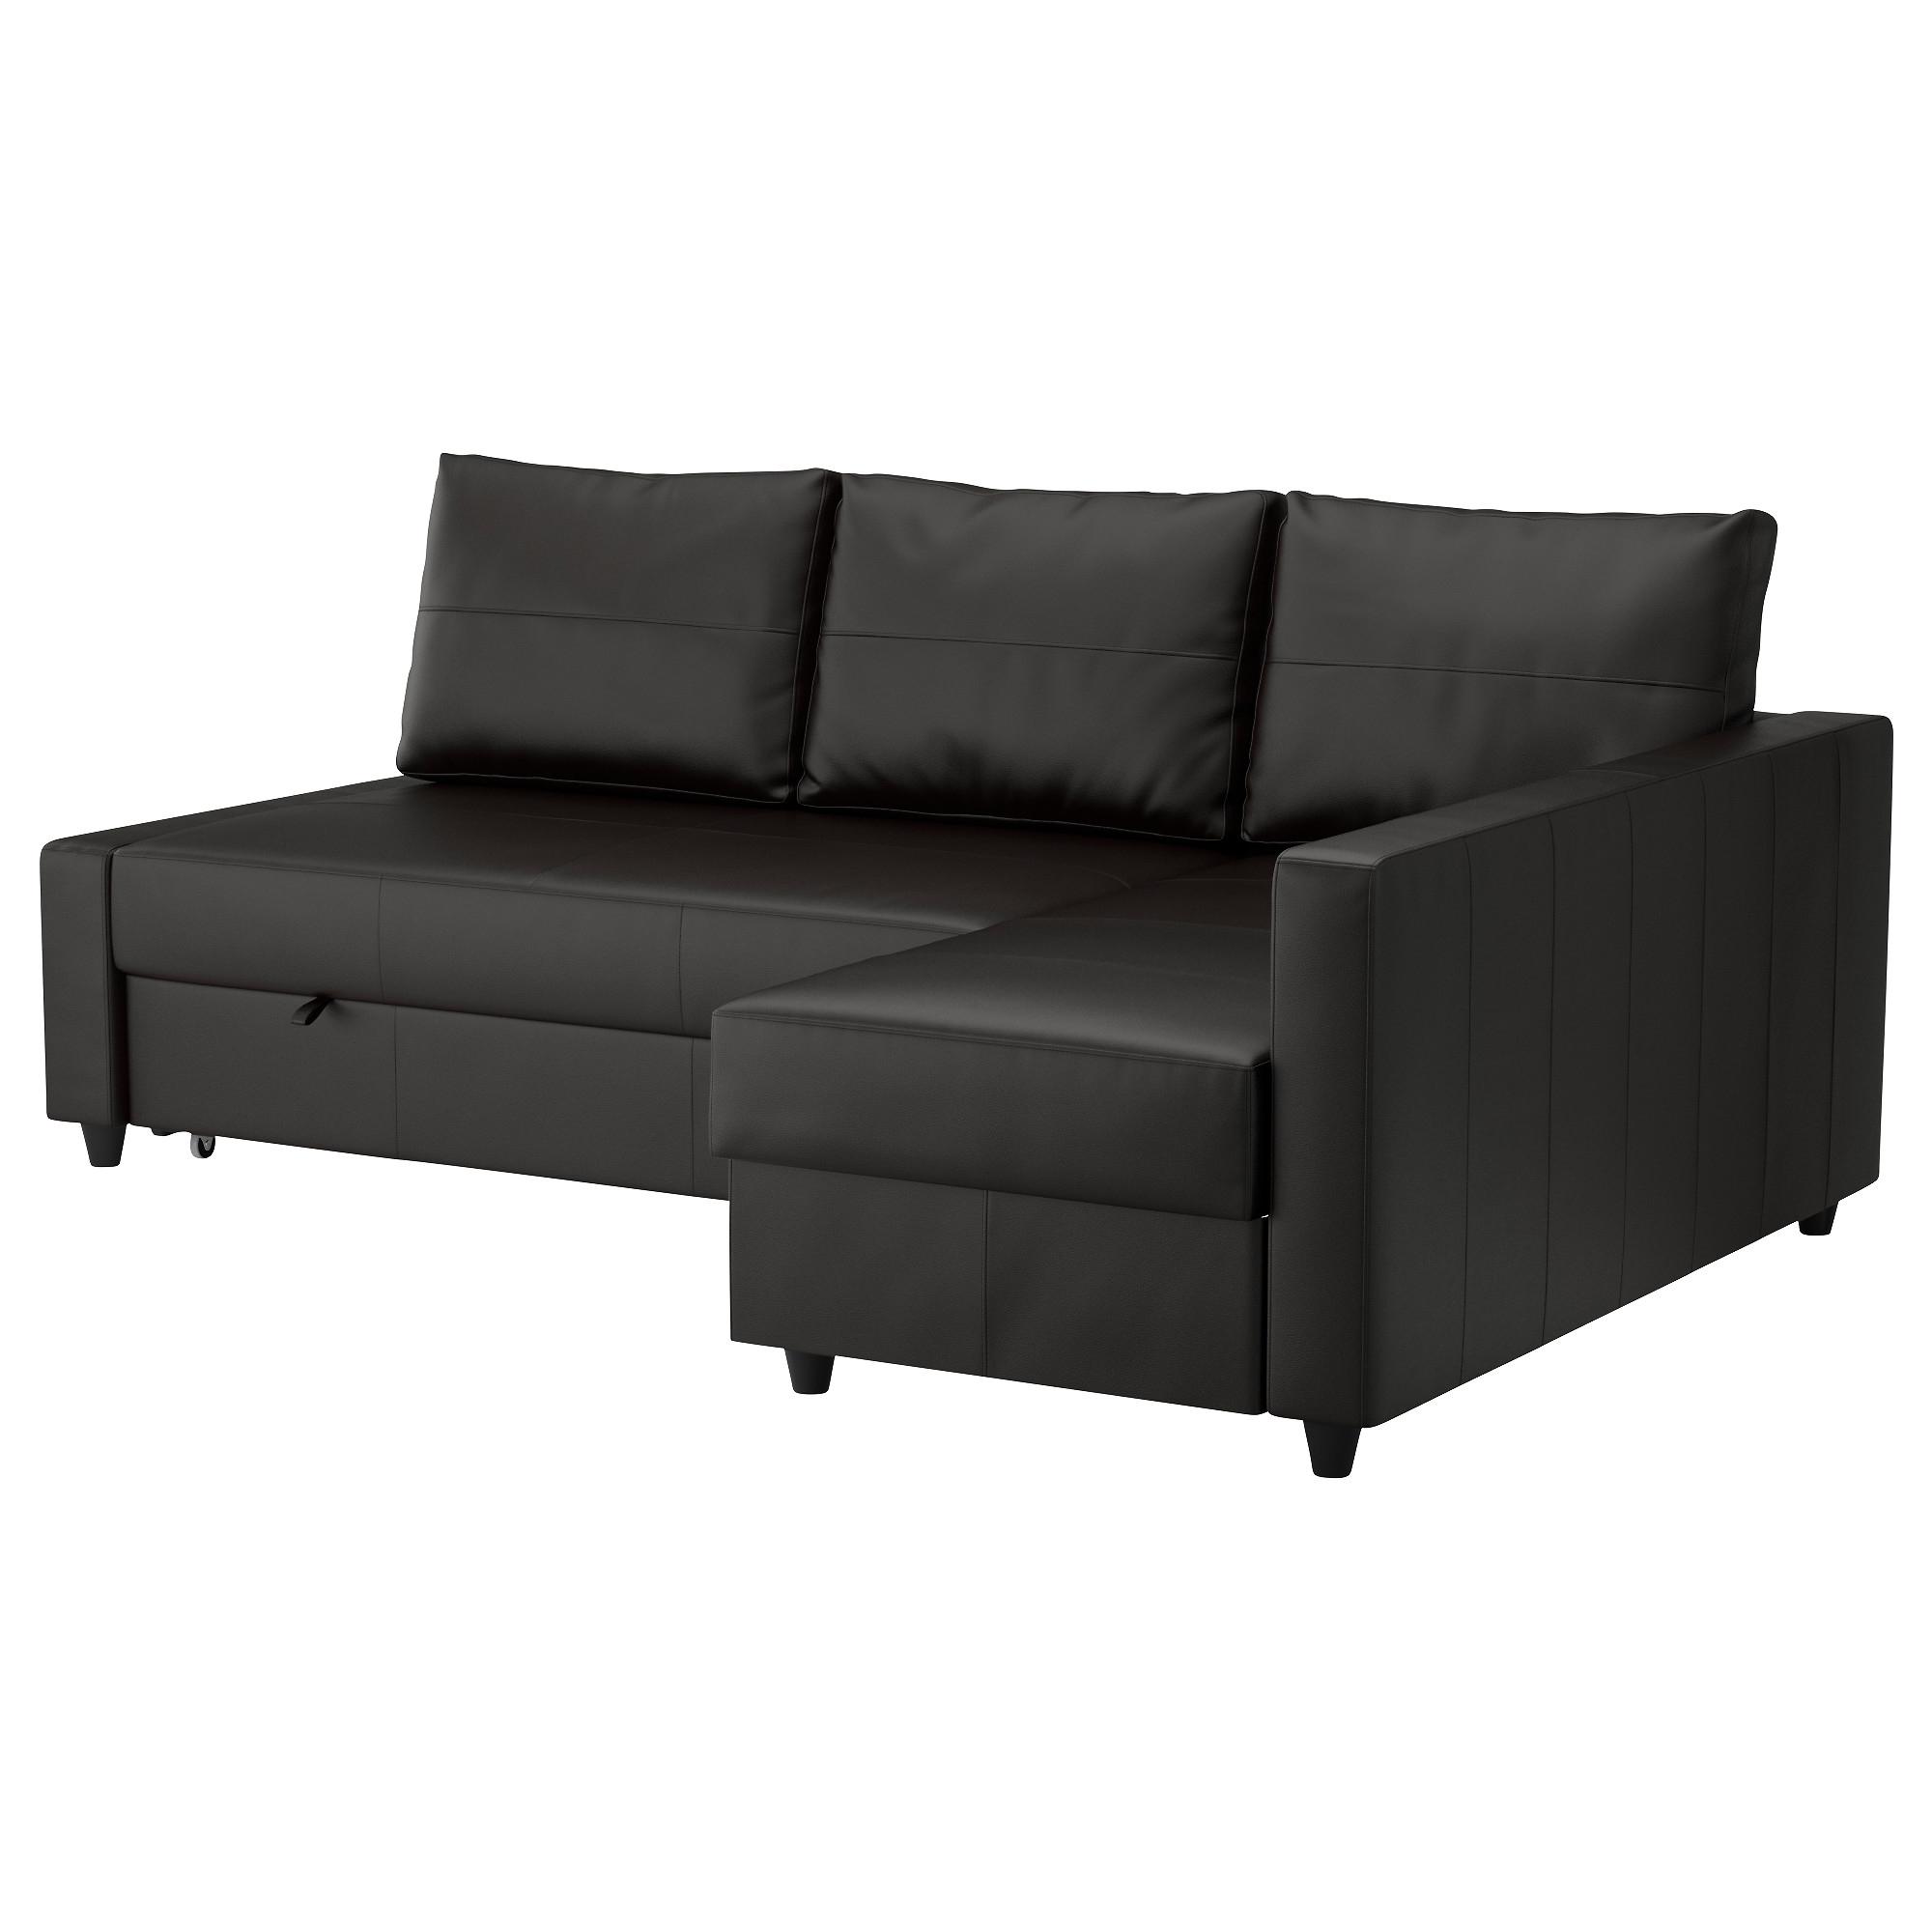 FRIHETEN sofá cama 3 pl con diván, BOMSTAD negro